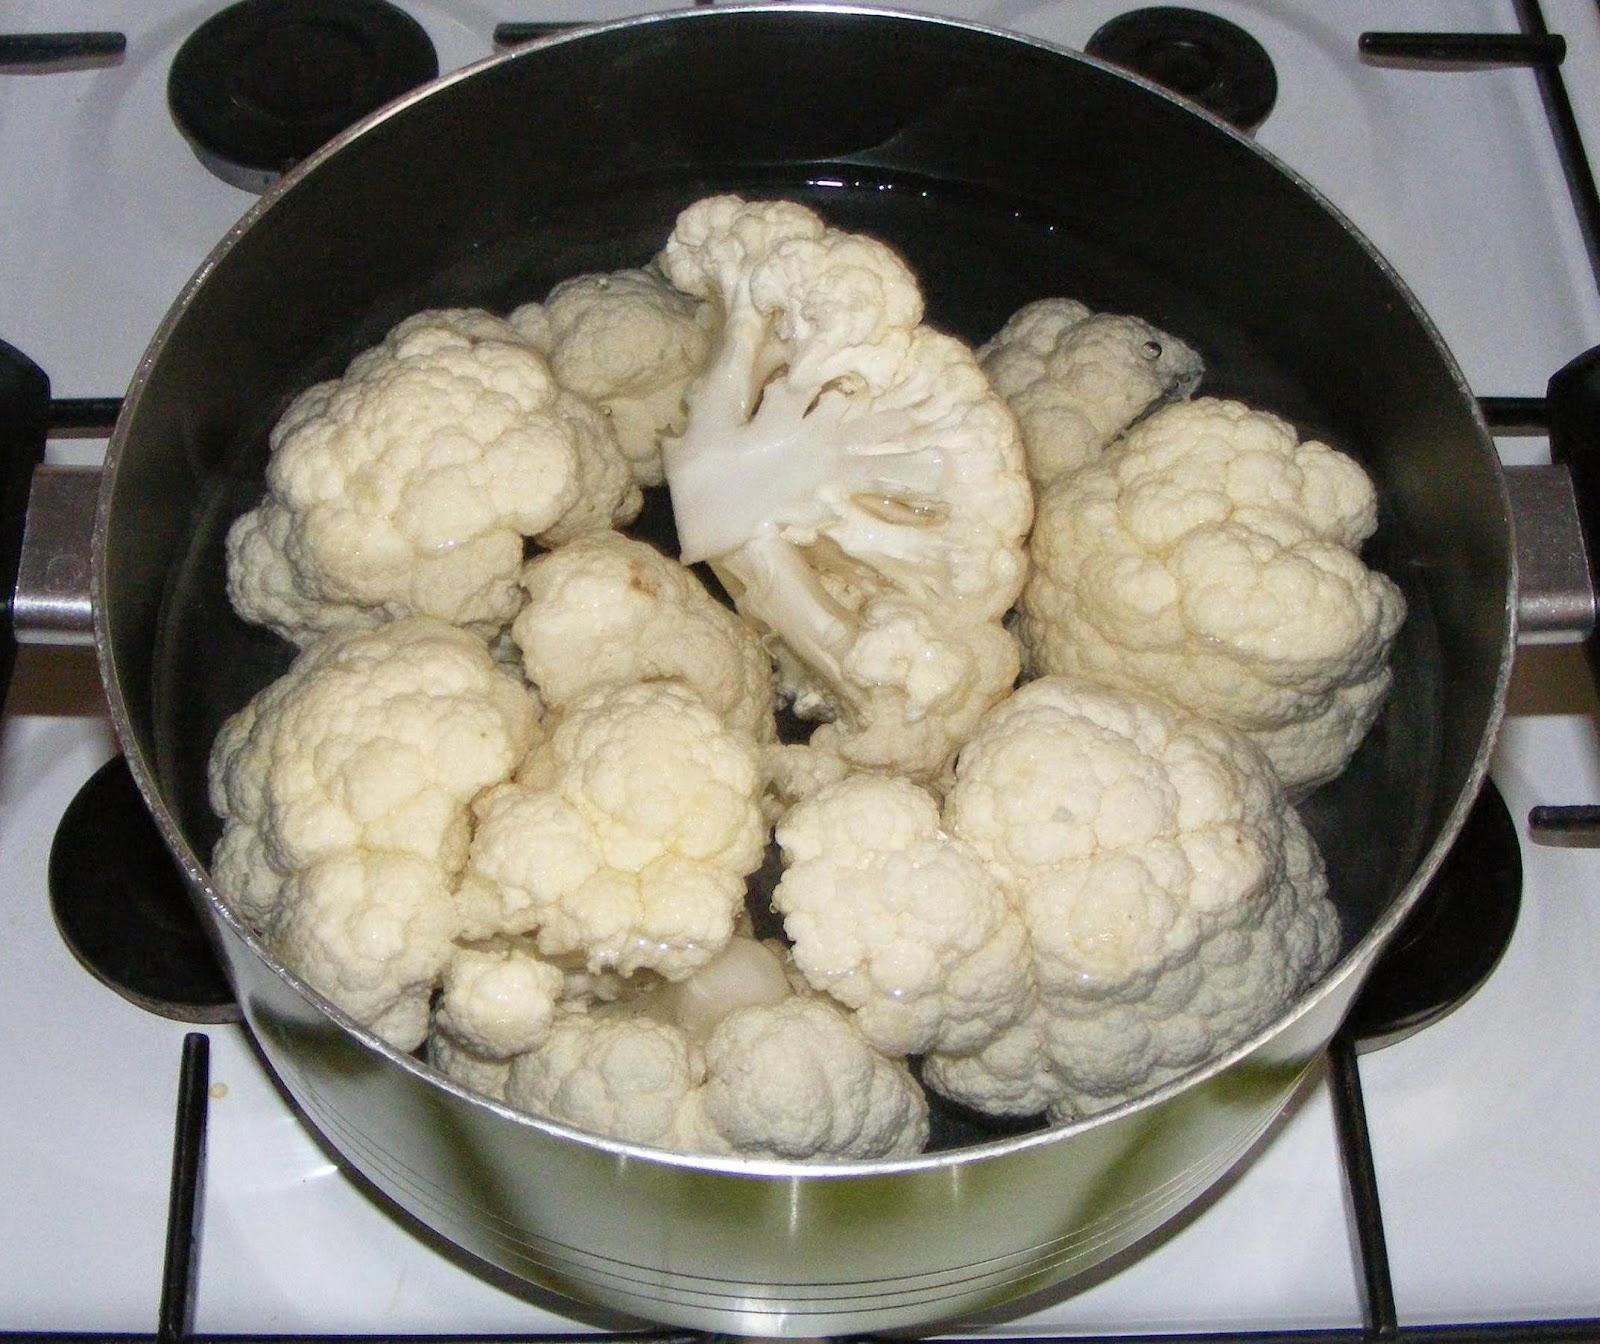 conopida, legume, leguma, conopida de gradina, retete cu conopida, preparate din conopida, conopida romaneasca, conopida de tara, conopida de curte, retete si preparate culinare din conopida, conopida retete, reteta conopida, preparare conopida,